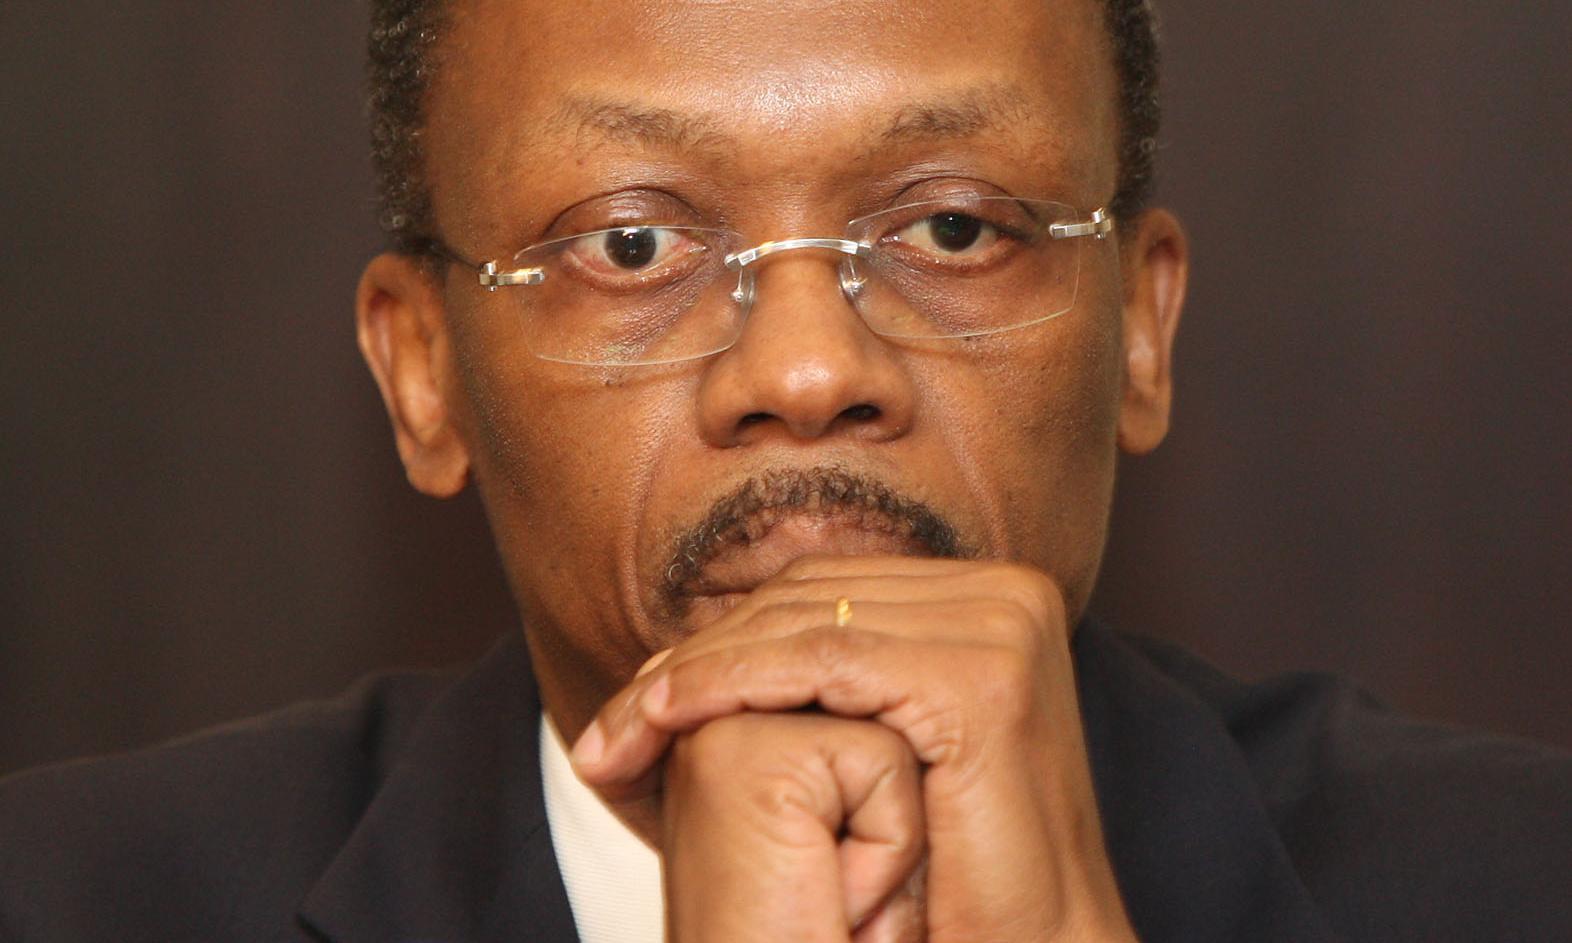 Failing Haiti and forgetting Jean-Bertrand Aristide Aristide